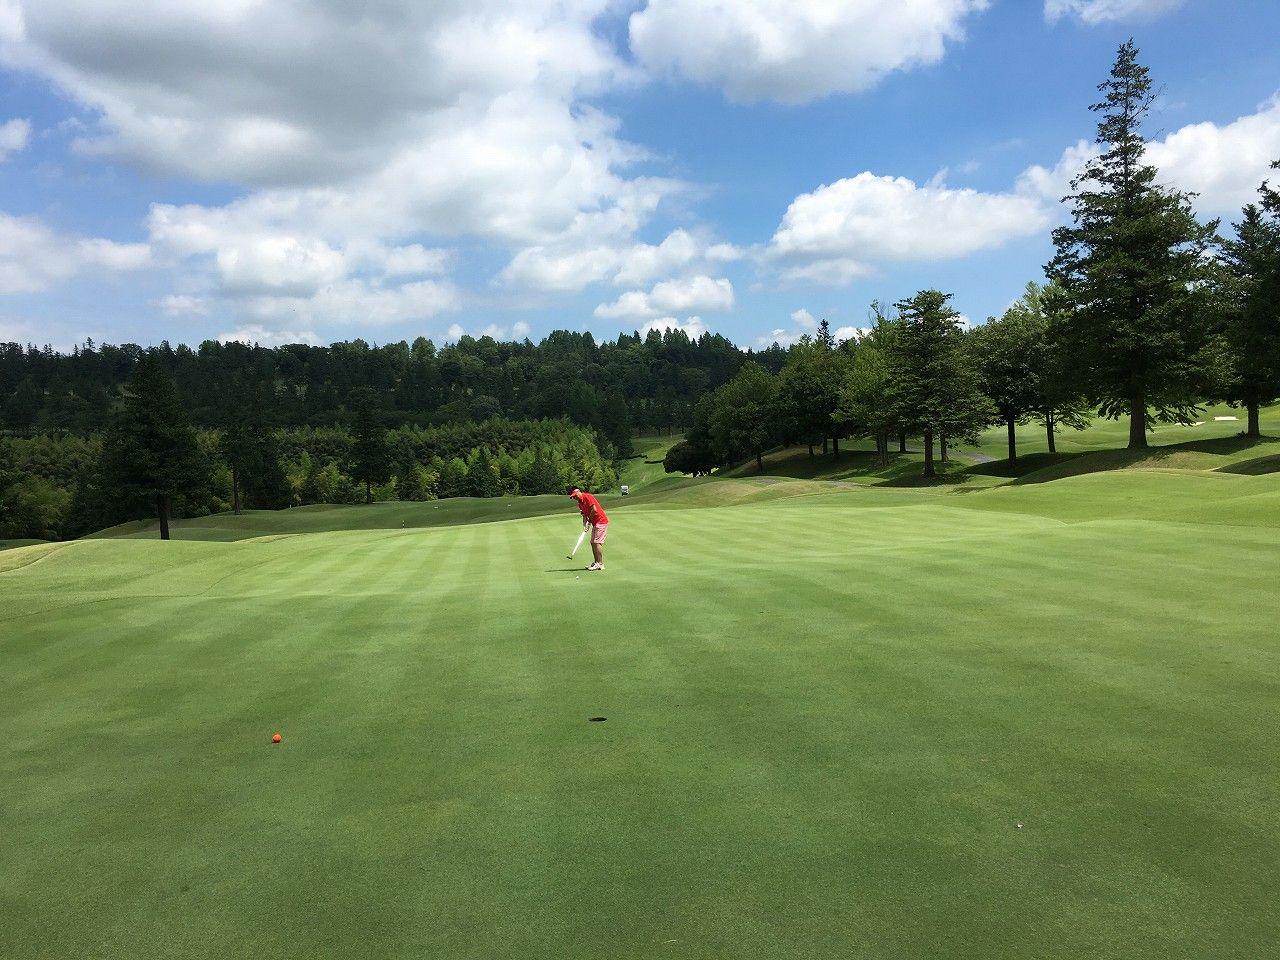 29 第二回幼馴染ゴルフ大会 8